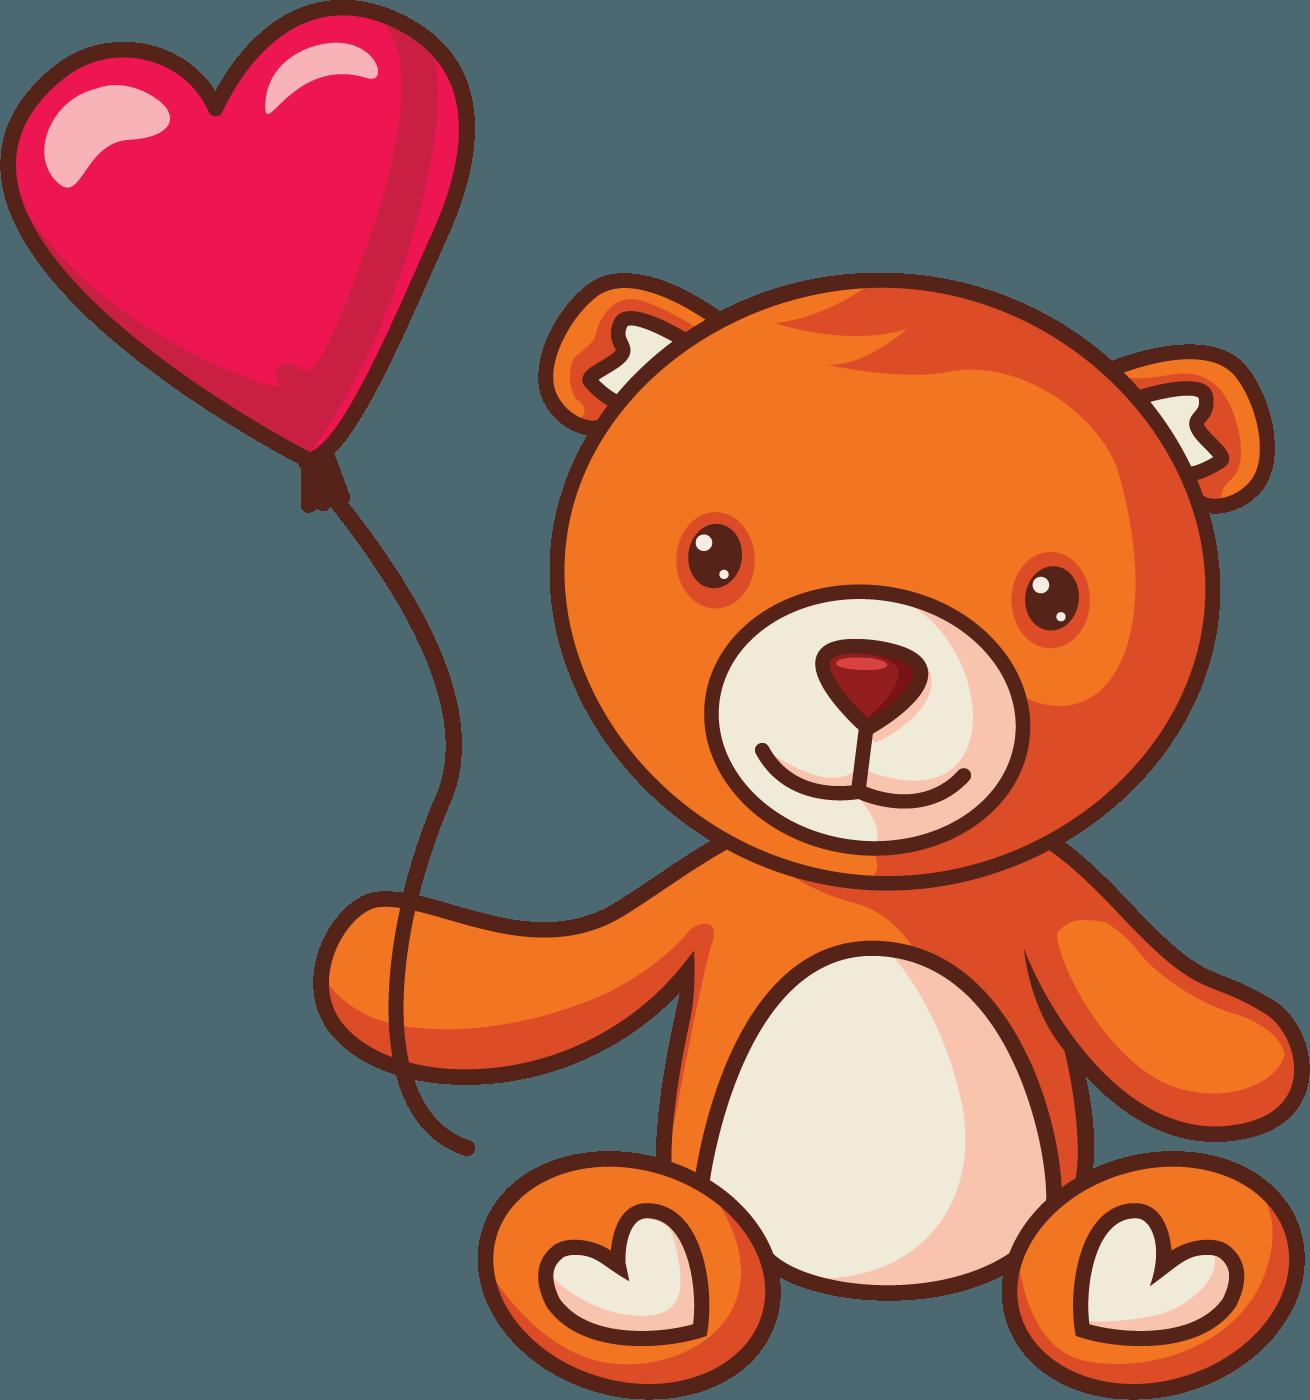 Free Vector Teddy Bears Set [PNG]